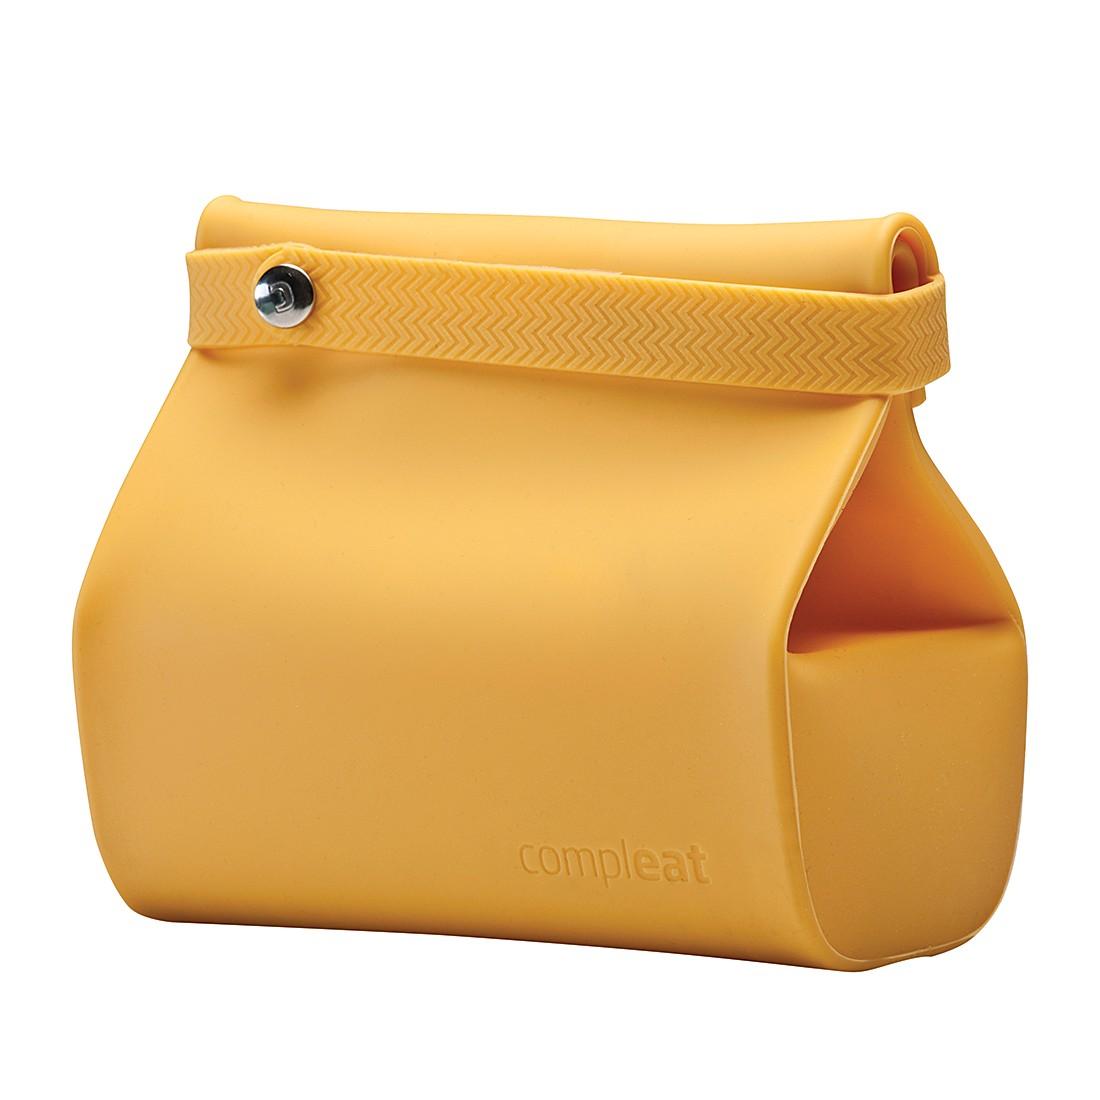 Lunchbox Foodbag – Silikon – Gelb, Unikia bestellen